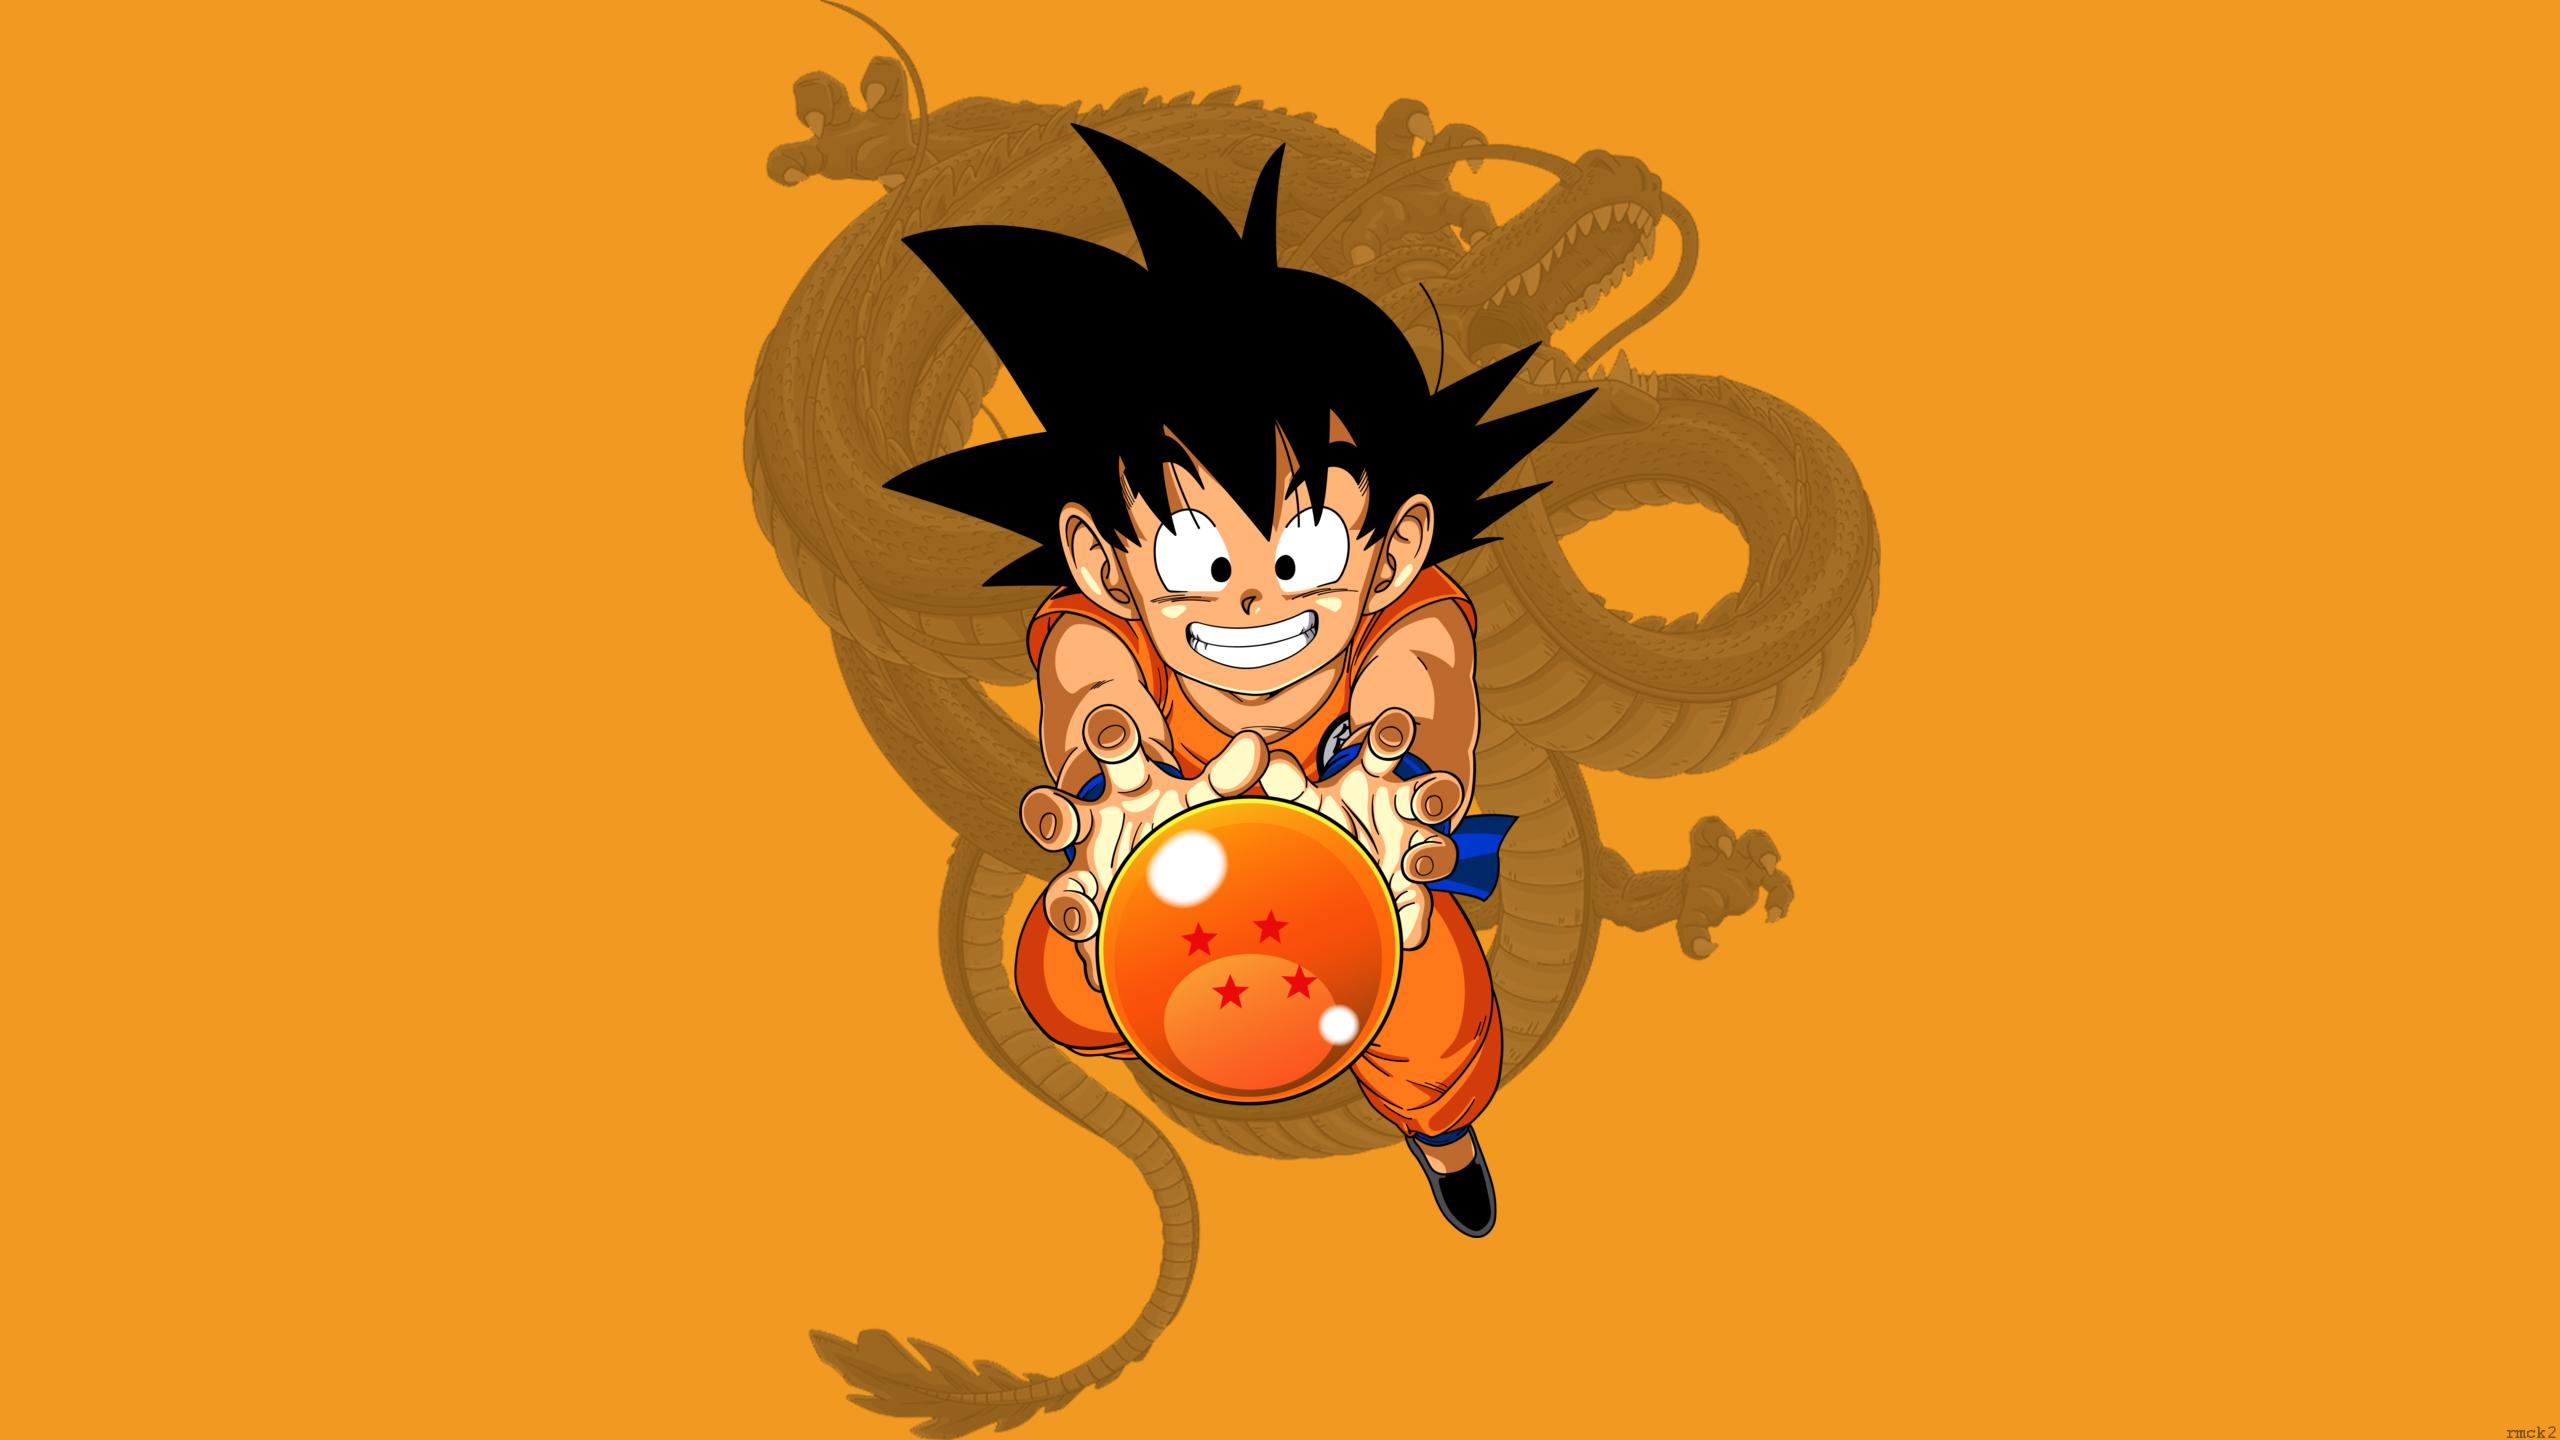 Great Wallpaper Dragon Ball Z Deviantart - dragon_ball_wallpaper_2_by_rmck2-d8h46t5  You Should Have_30991 .jpg